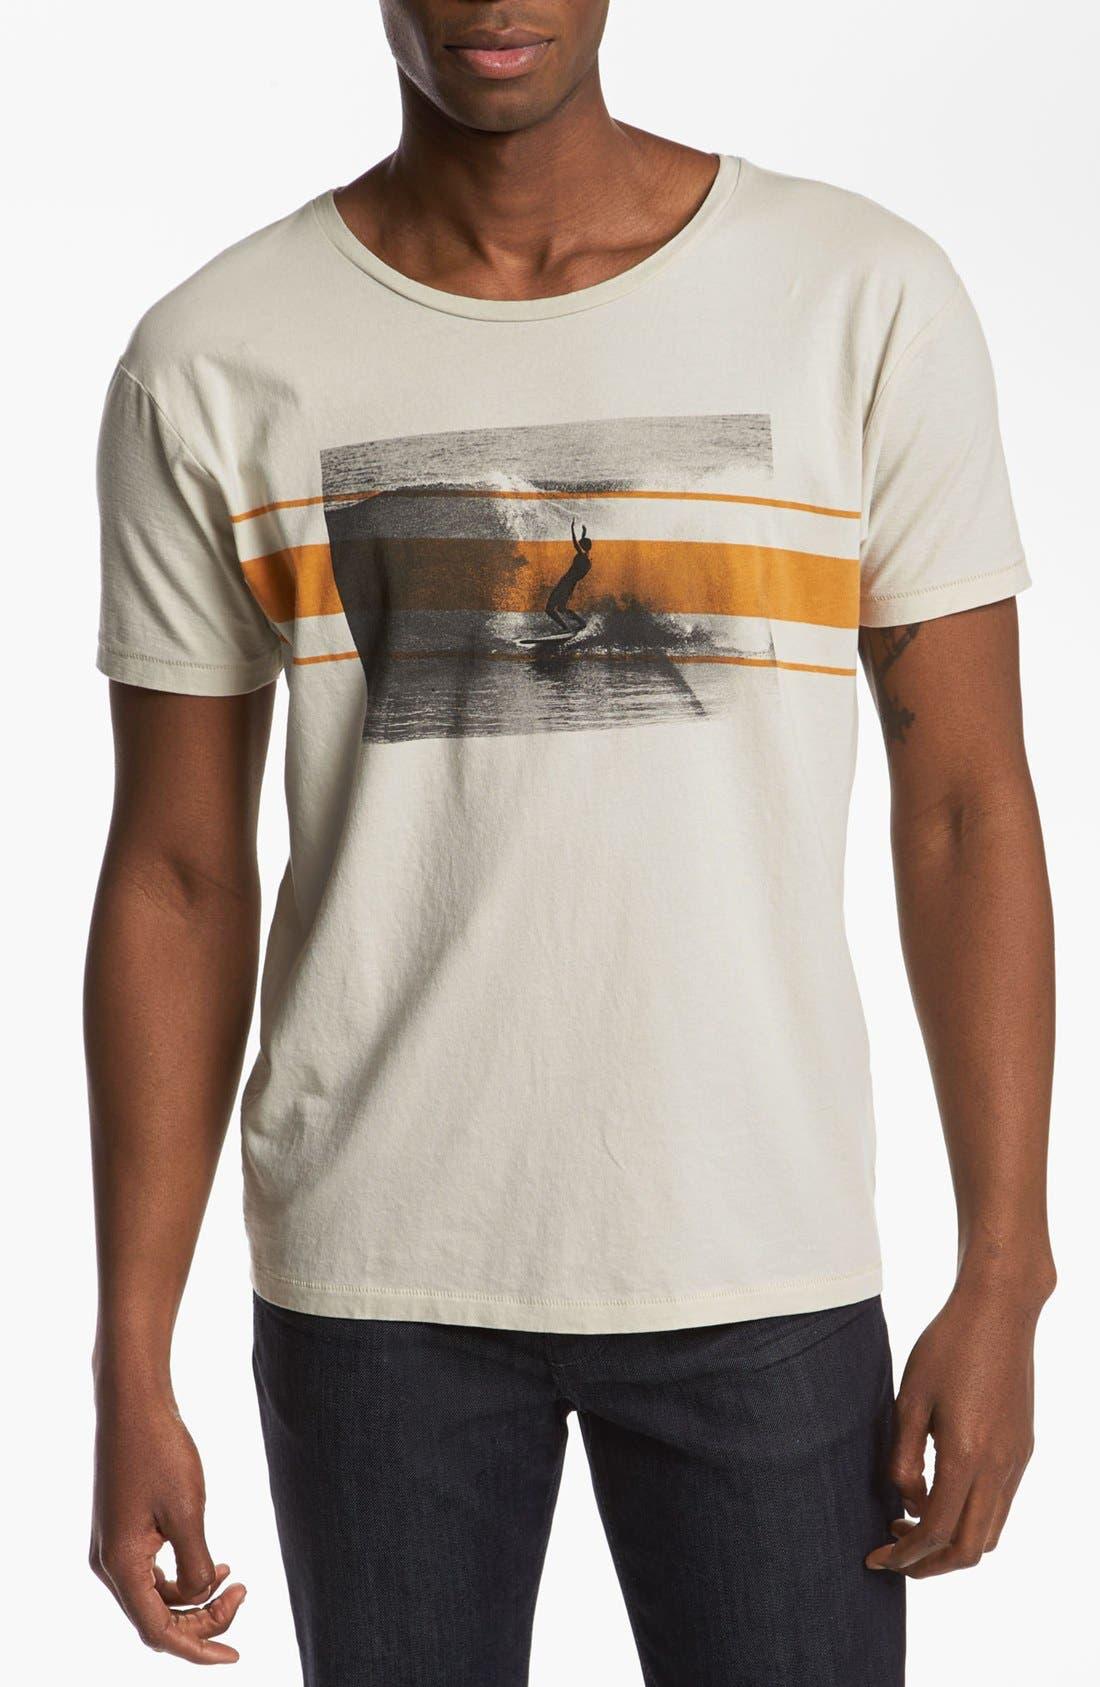 Main Image - Vans 'Freakwaive Cool' T-Shirt